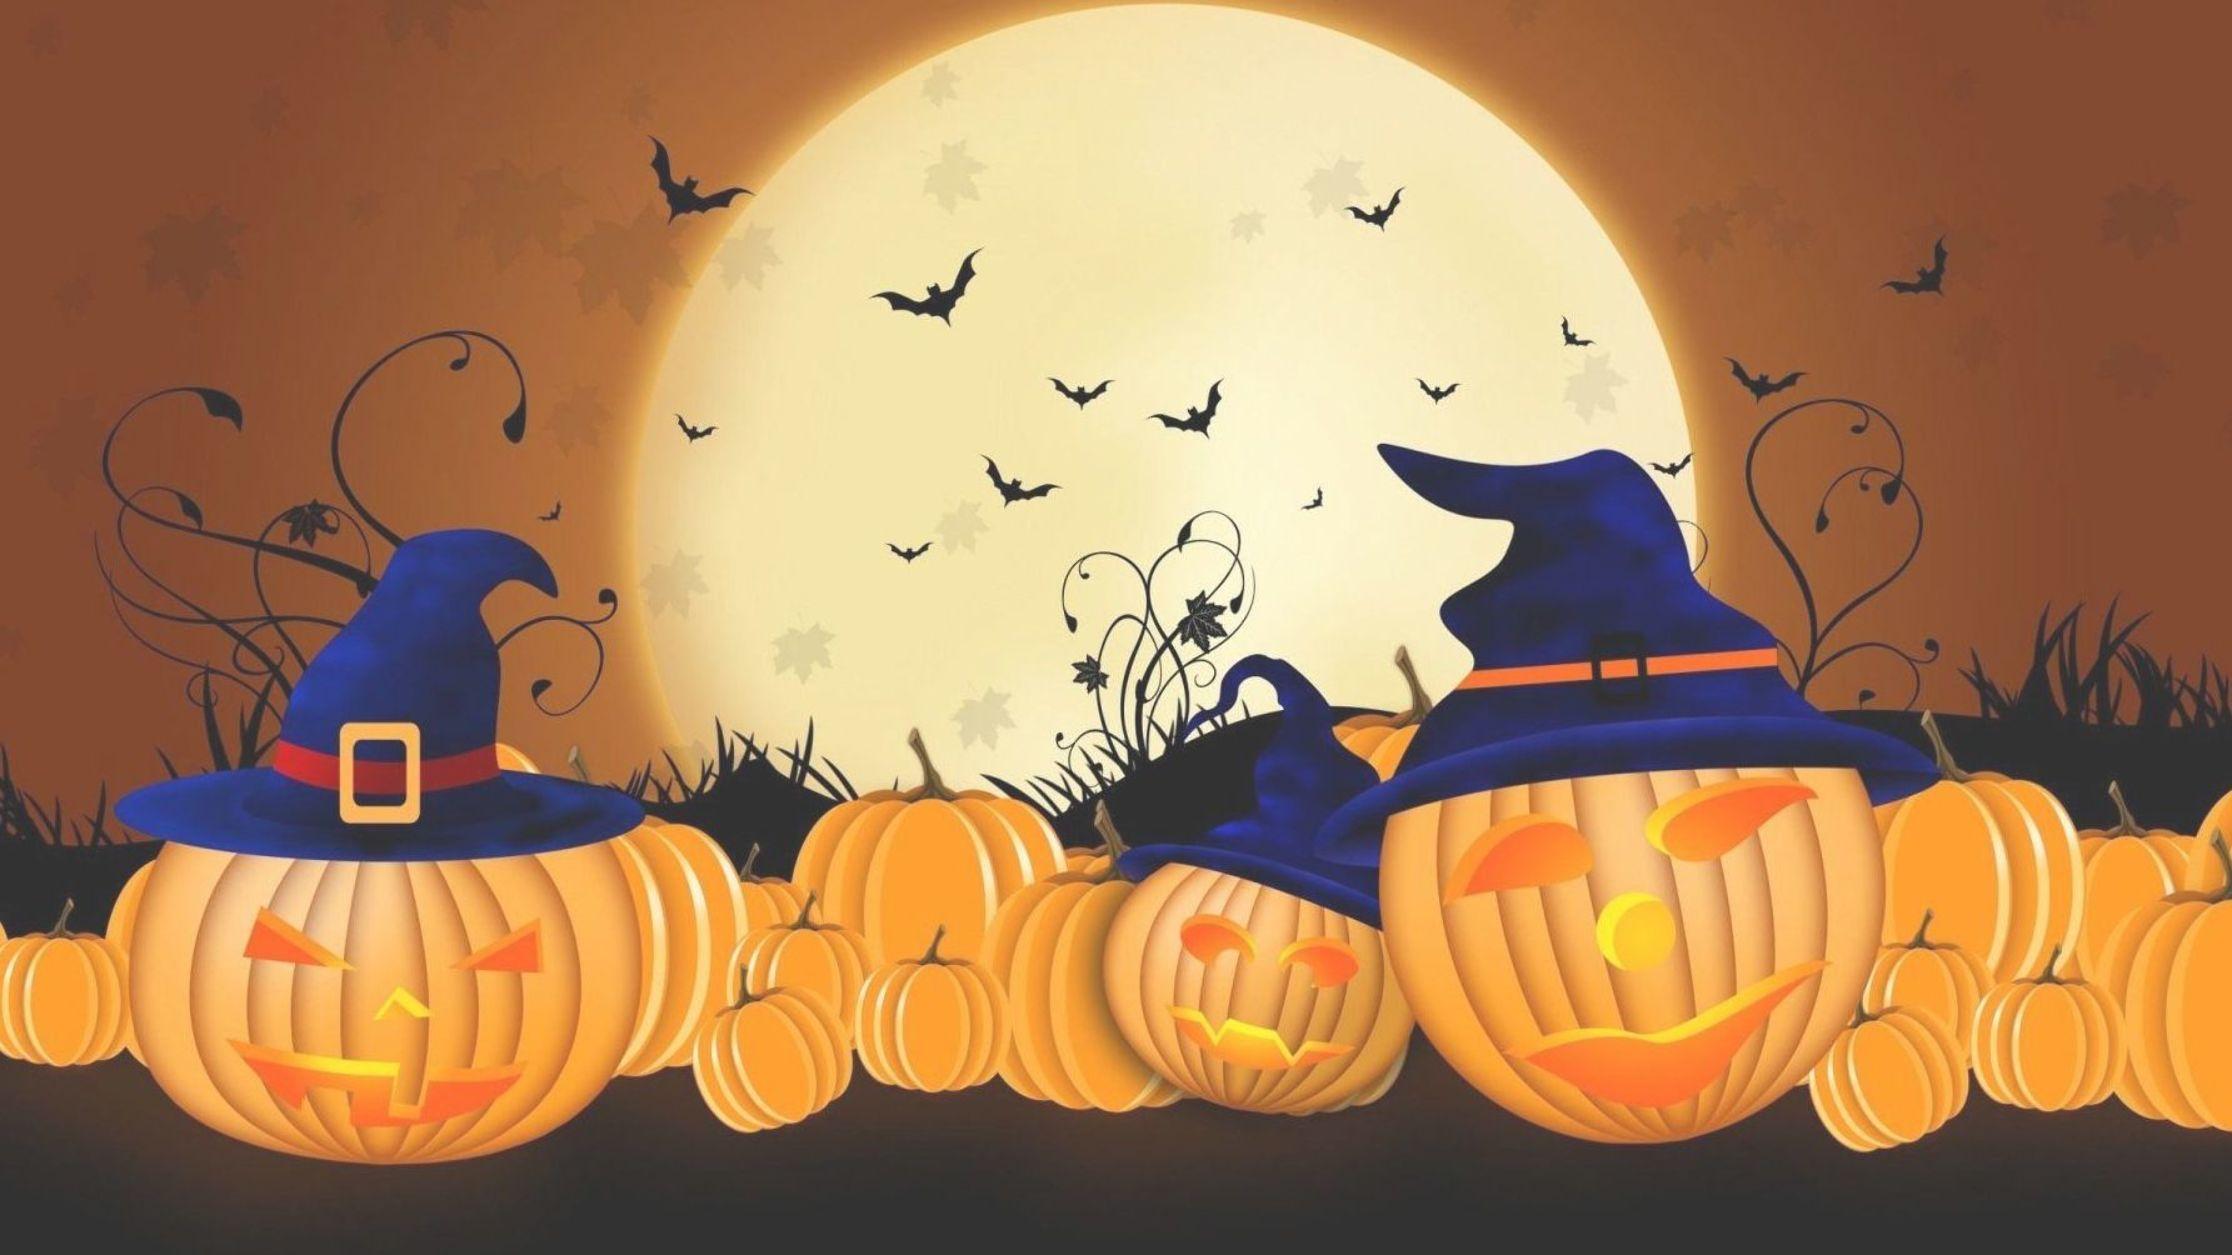 Halloween Backgrounds #Halloween #Backgrounds #wallpaper #halloweenbackgroundswallpapers